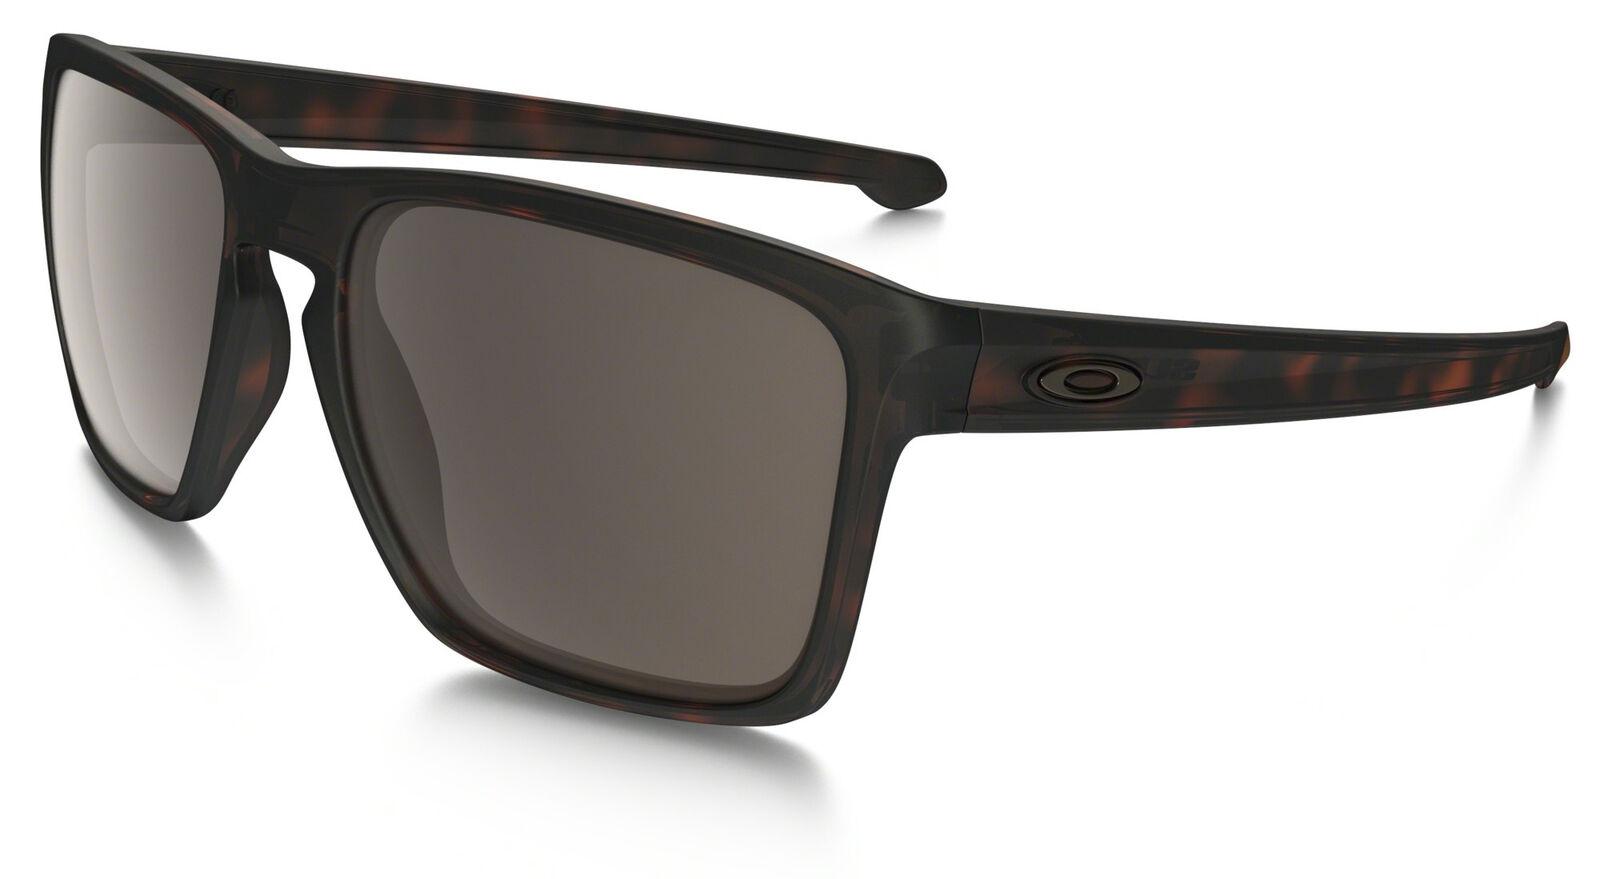 392400f779e Oakley Sliver XL OO9341-04 Sunglasses Matte Brown Tortoise   Warm ...